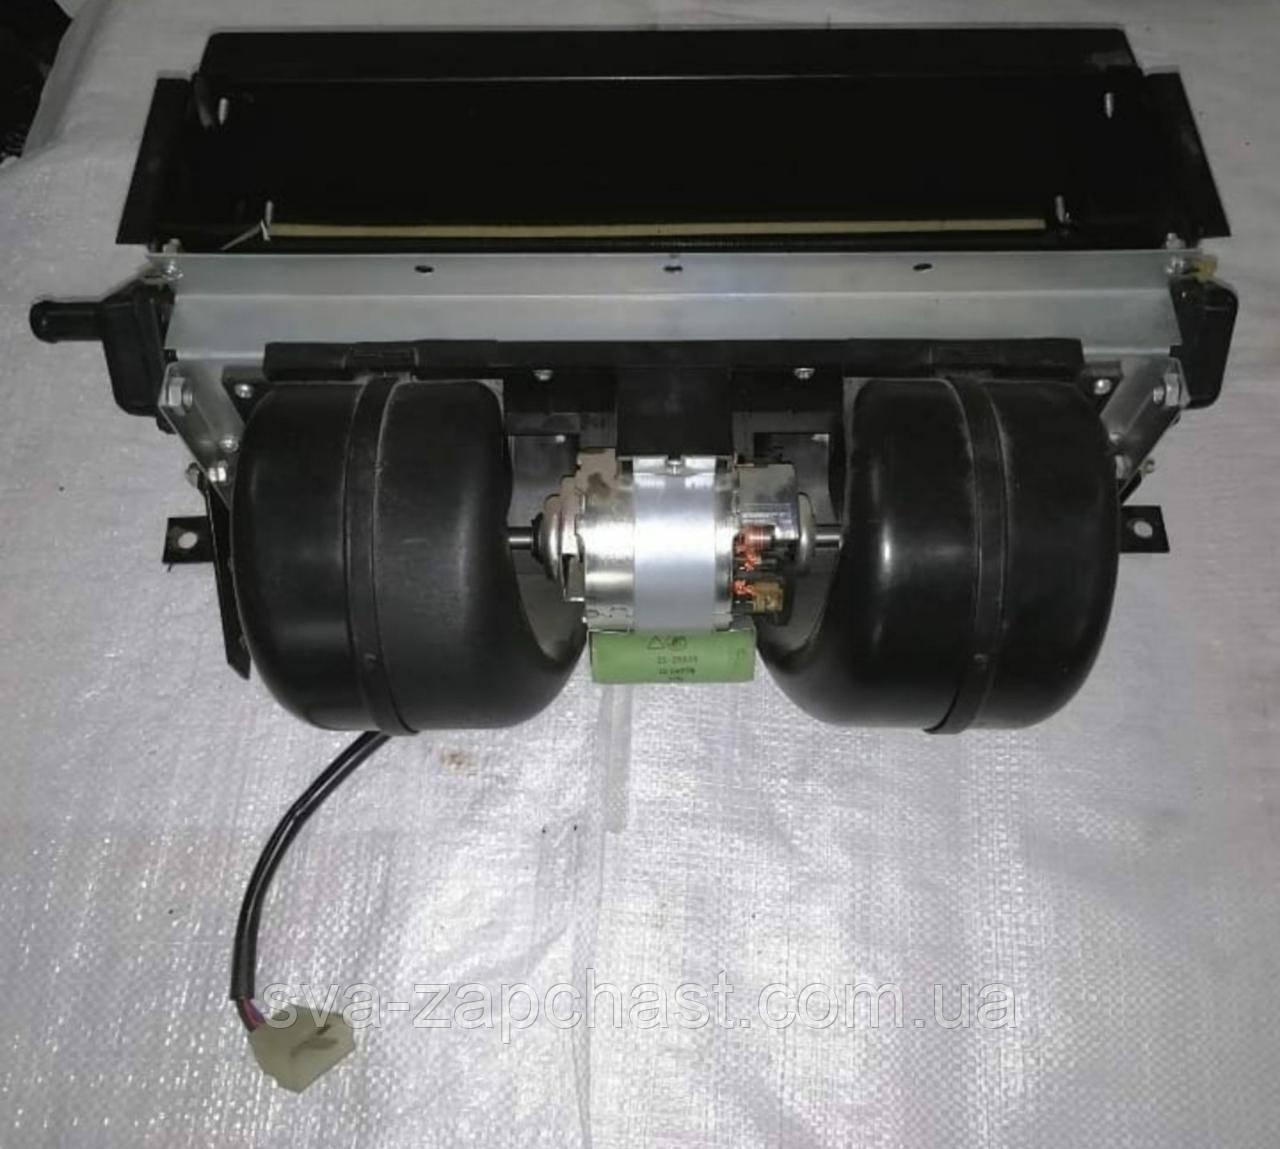 Отопитель-Вентилятор МТЗ-1221 1522 1522-8101100-01